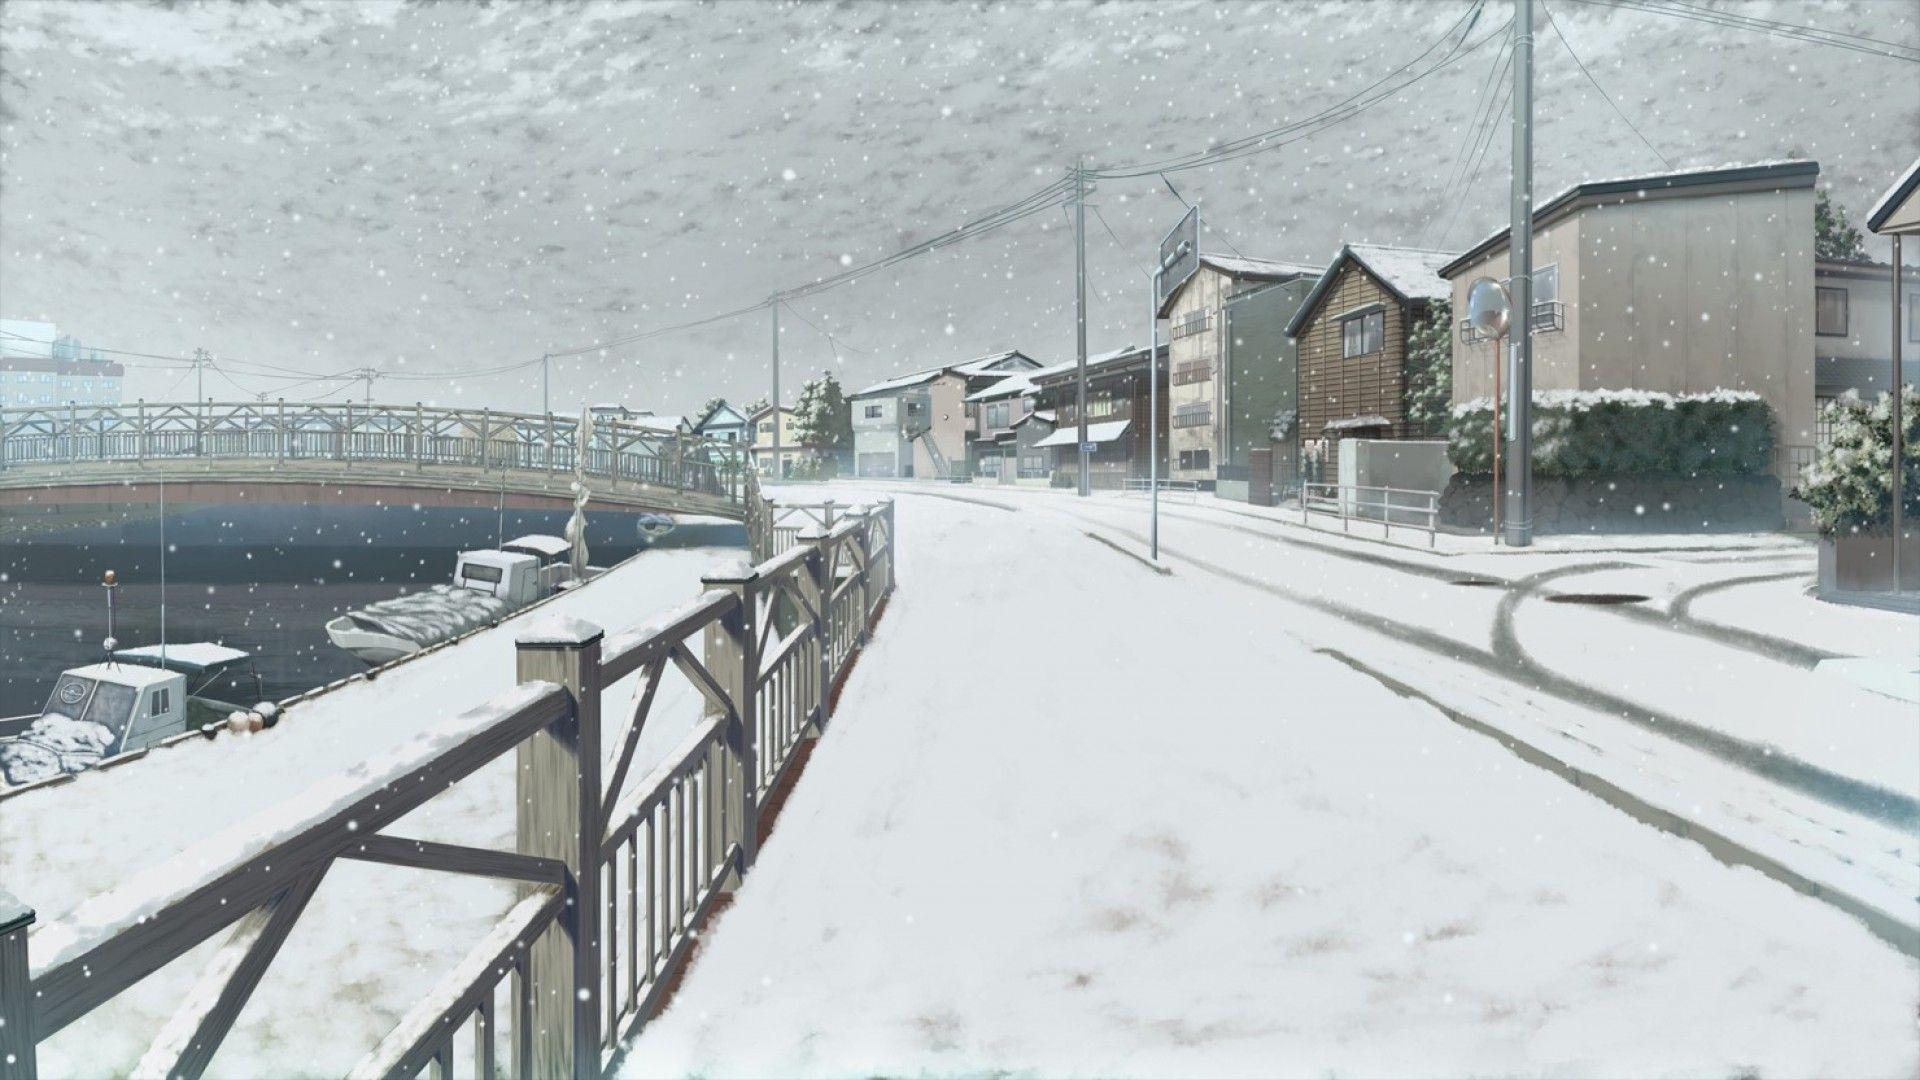 Beautiful Anime Scenery Google Search Scenery Wallpaper Winter Scenery Anime Scenery